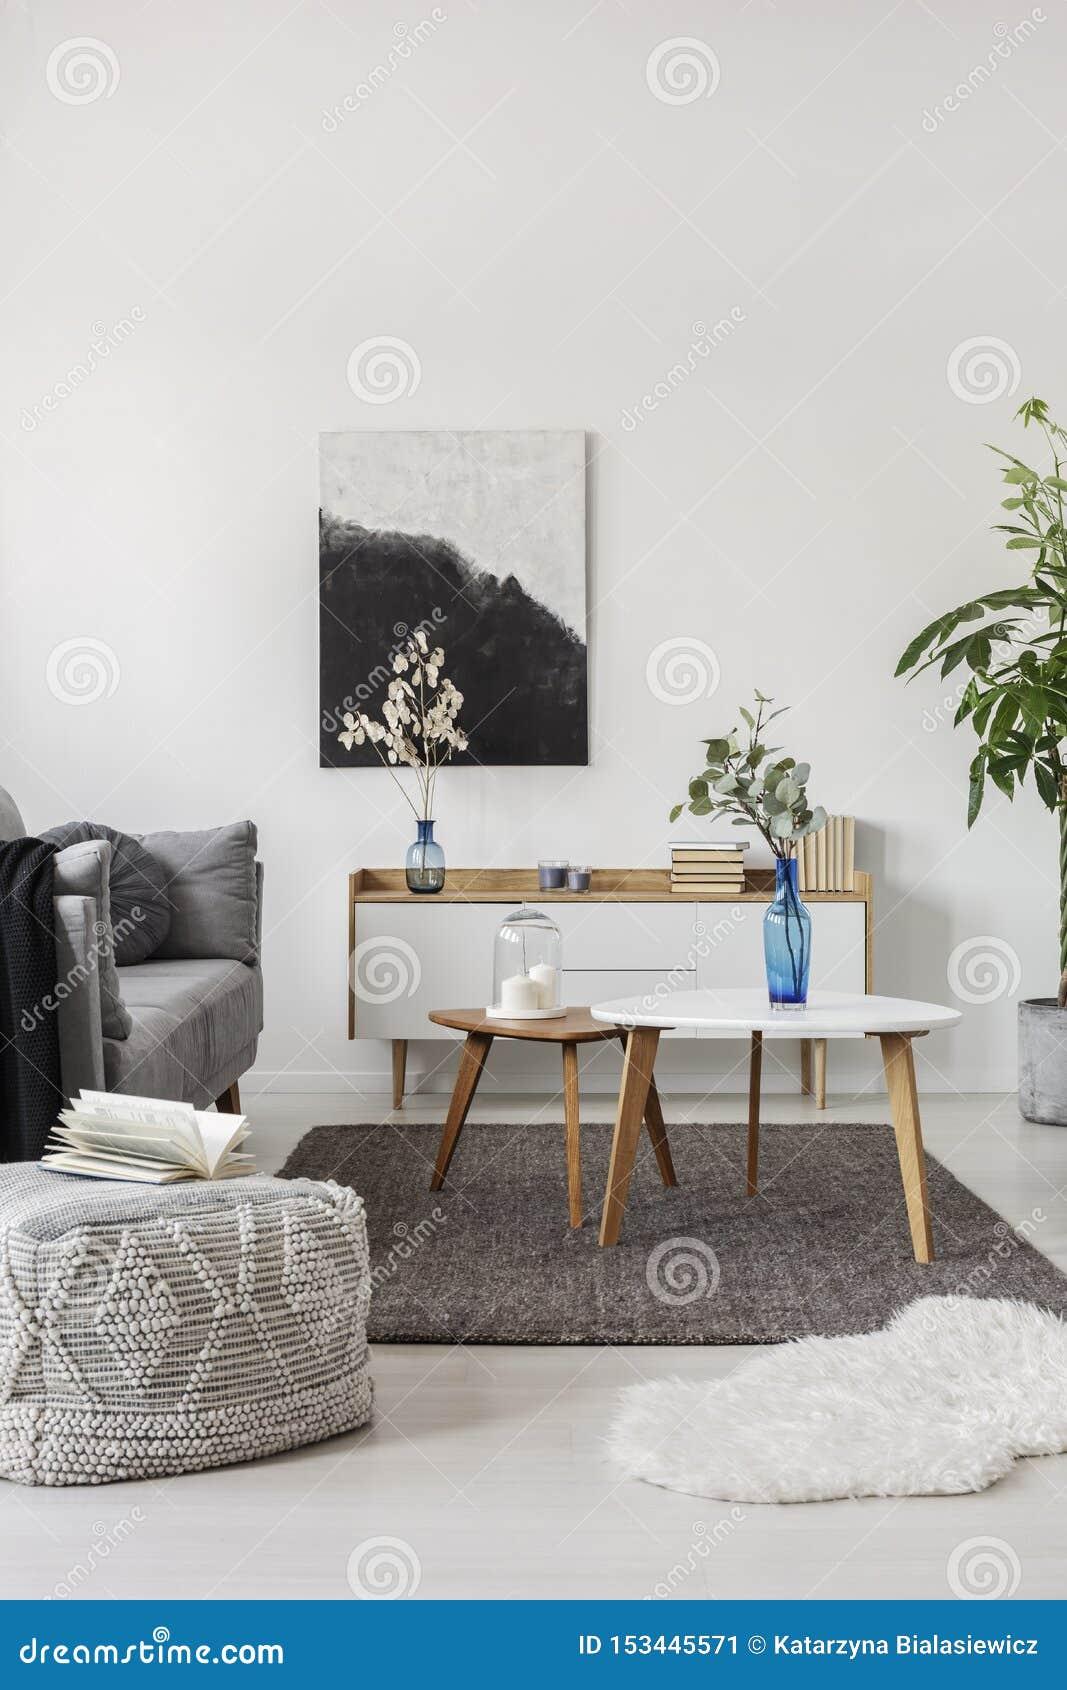 Grey Scandinavian Sofa In Bright Living Room Interior Stock Image Image Of Interior Condo 153445571